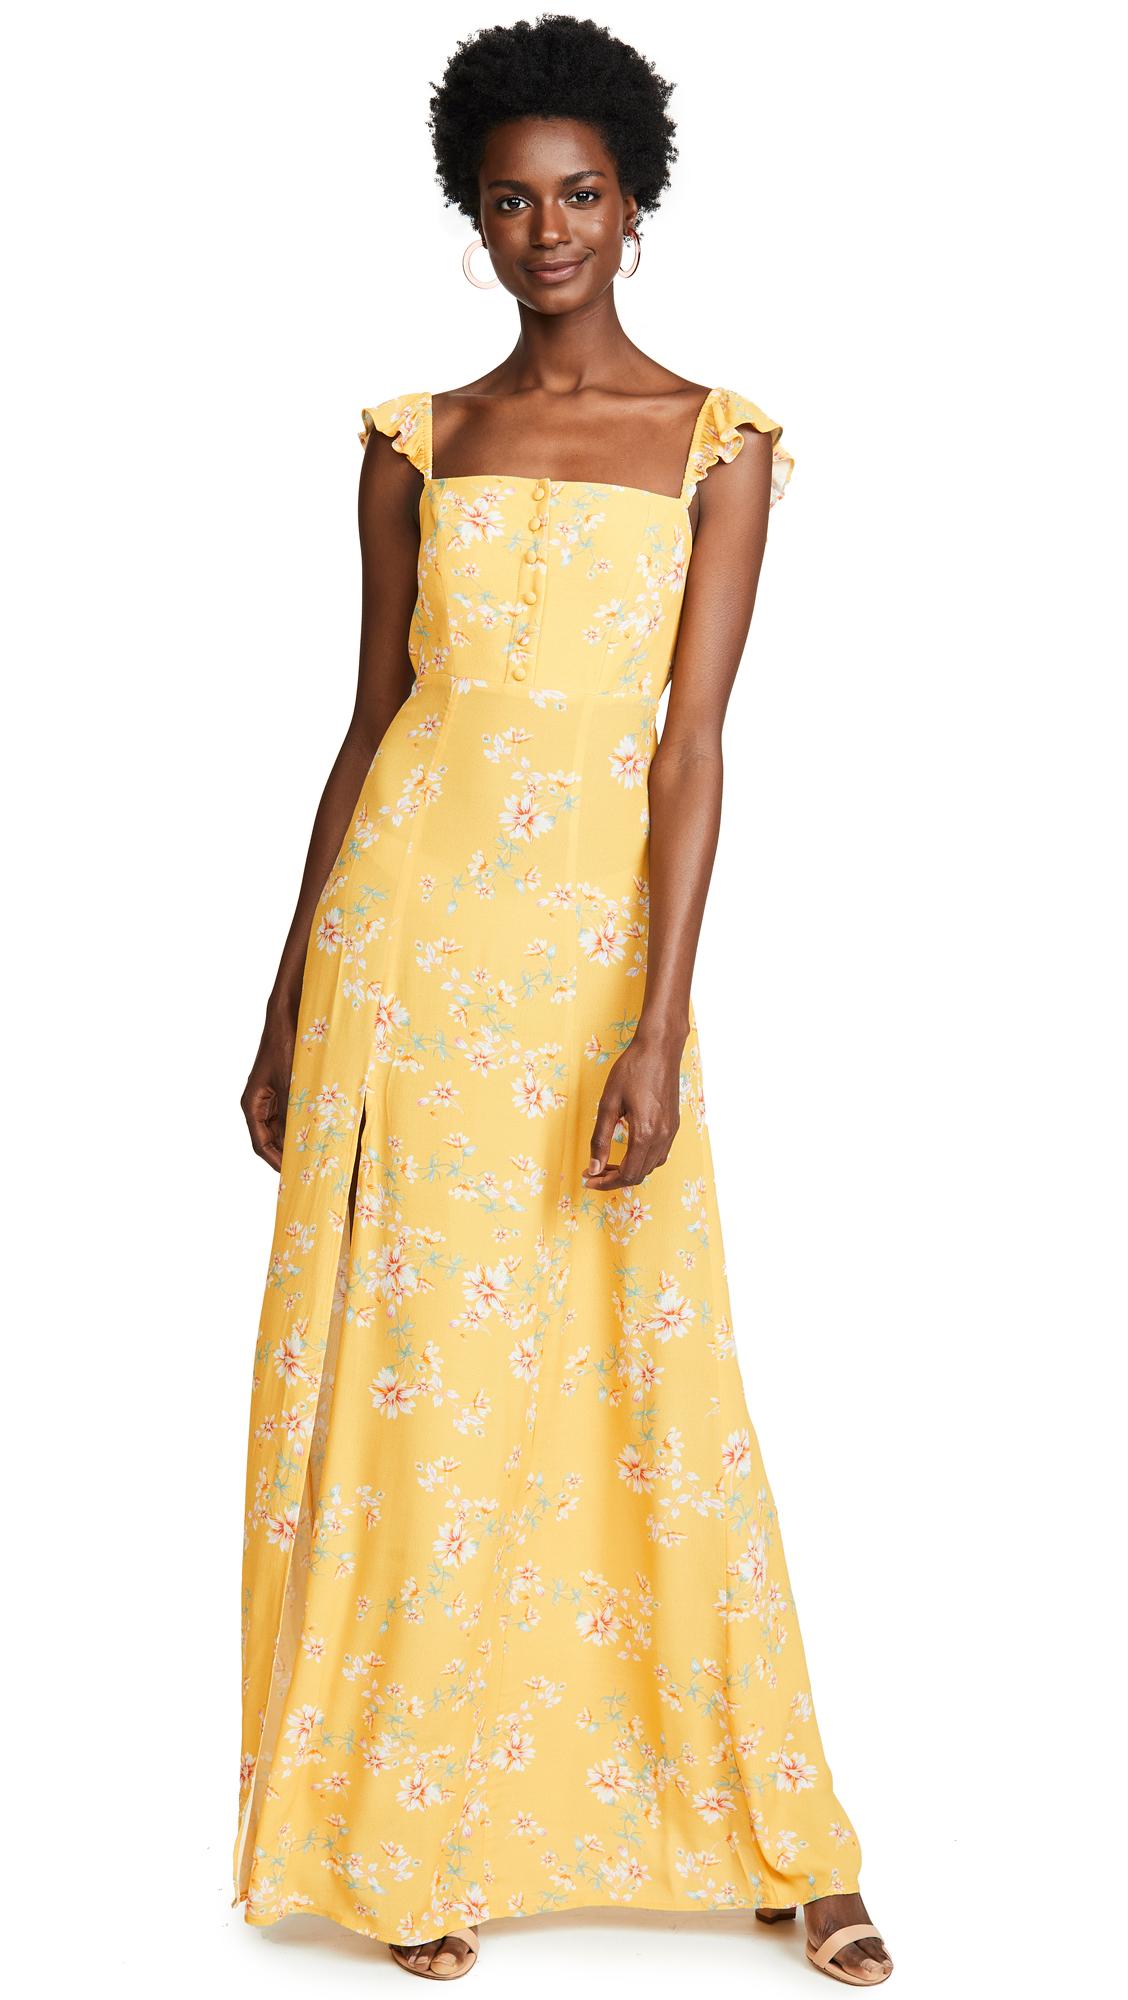 FLYNN SKYE Bardot Maxi Dress in Touch Of Honey